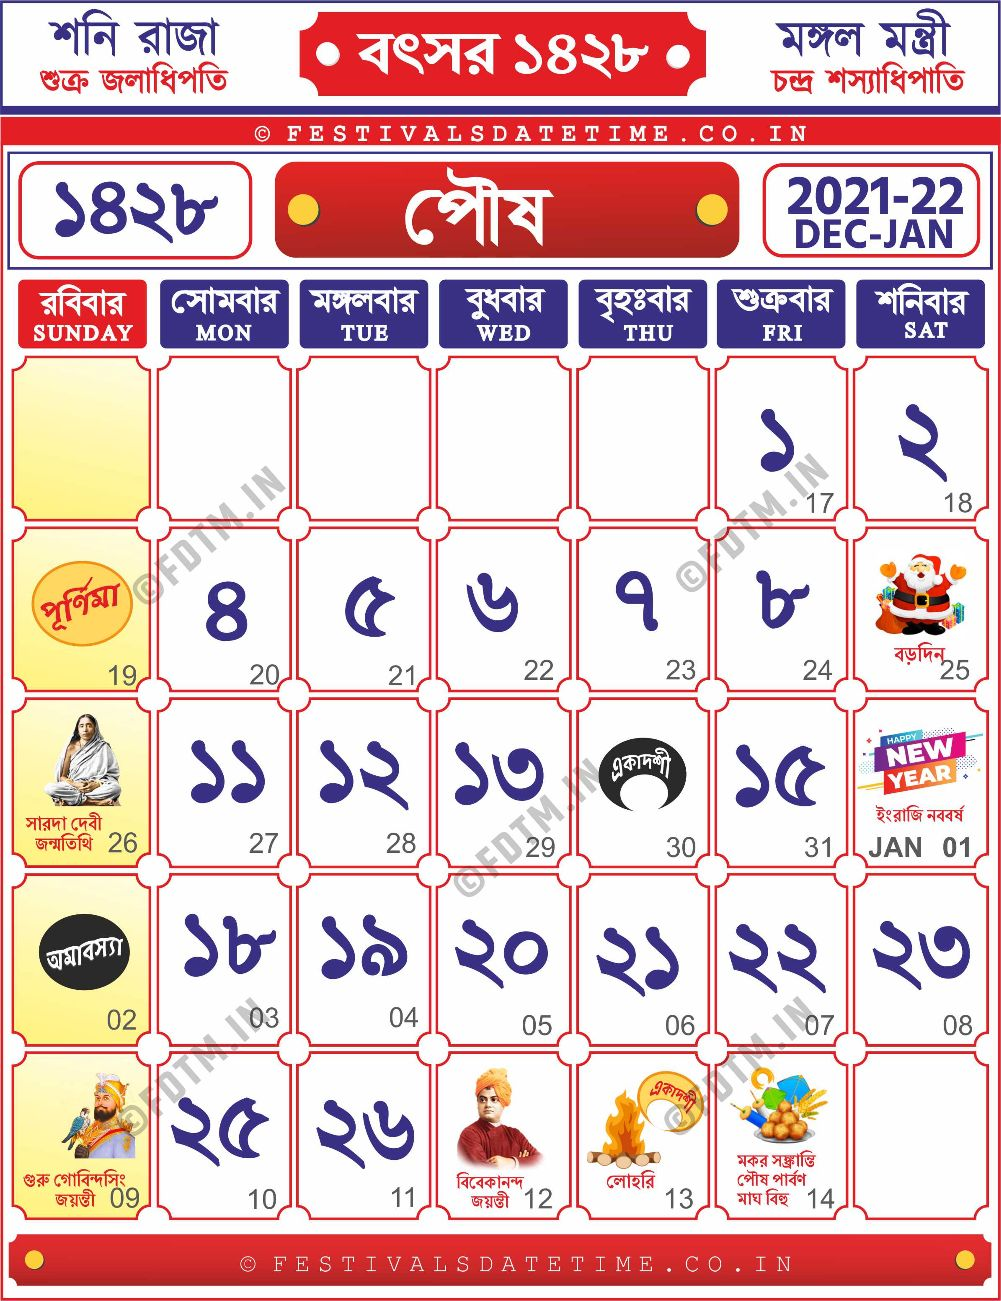 1428 Bengali Calendar - 1428 Poush Month Calendar - 1428 Poush Bangla Calendar